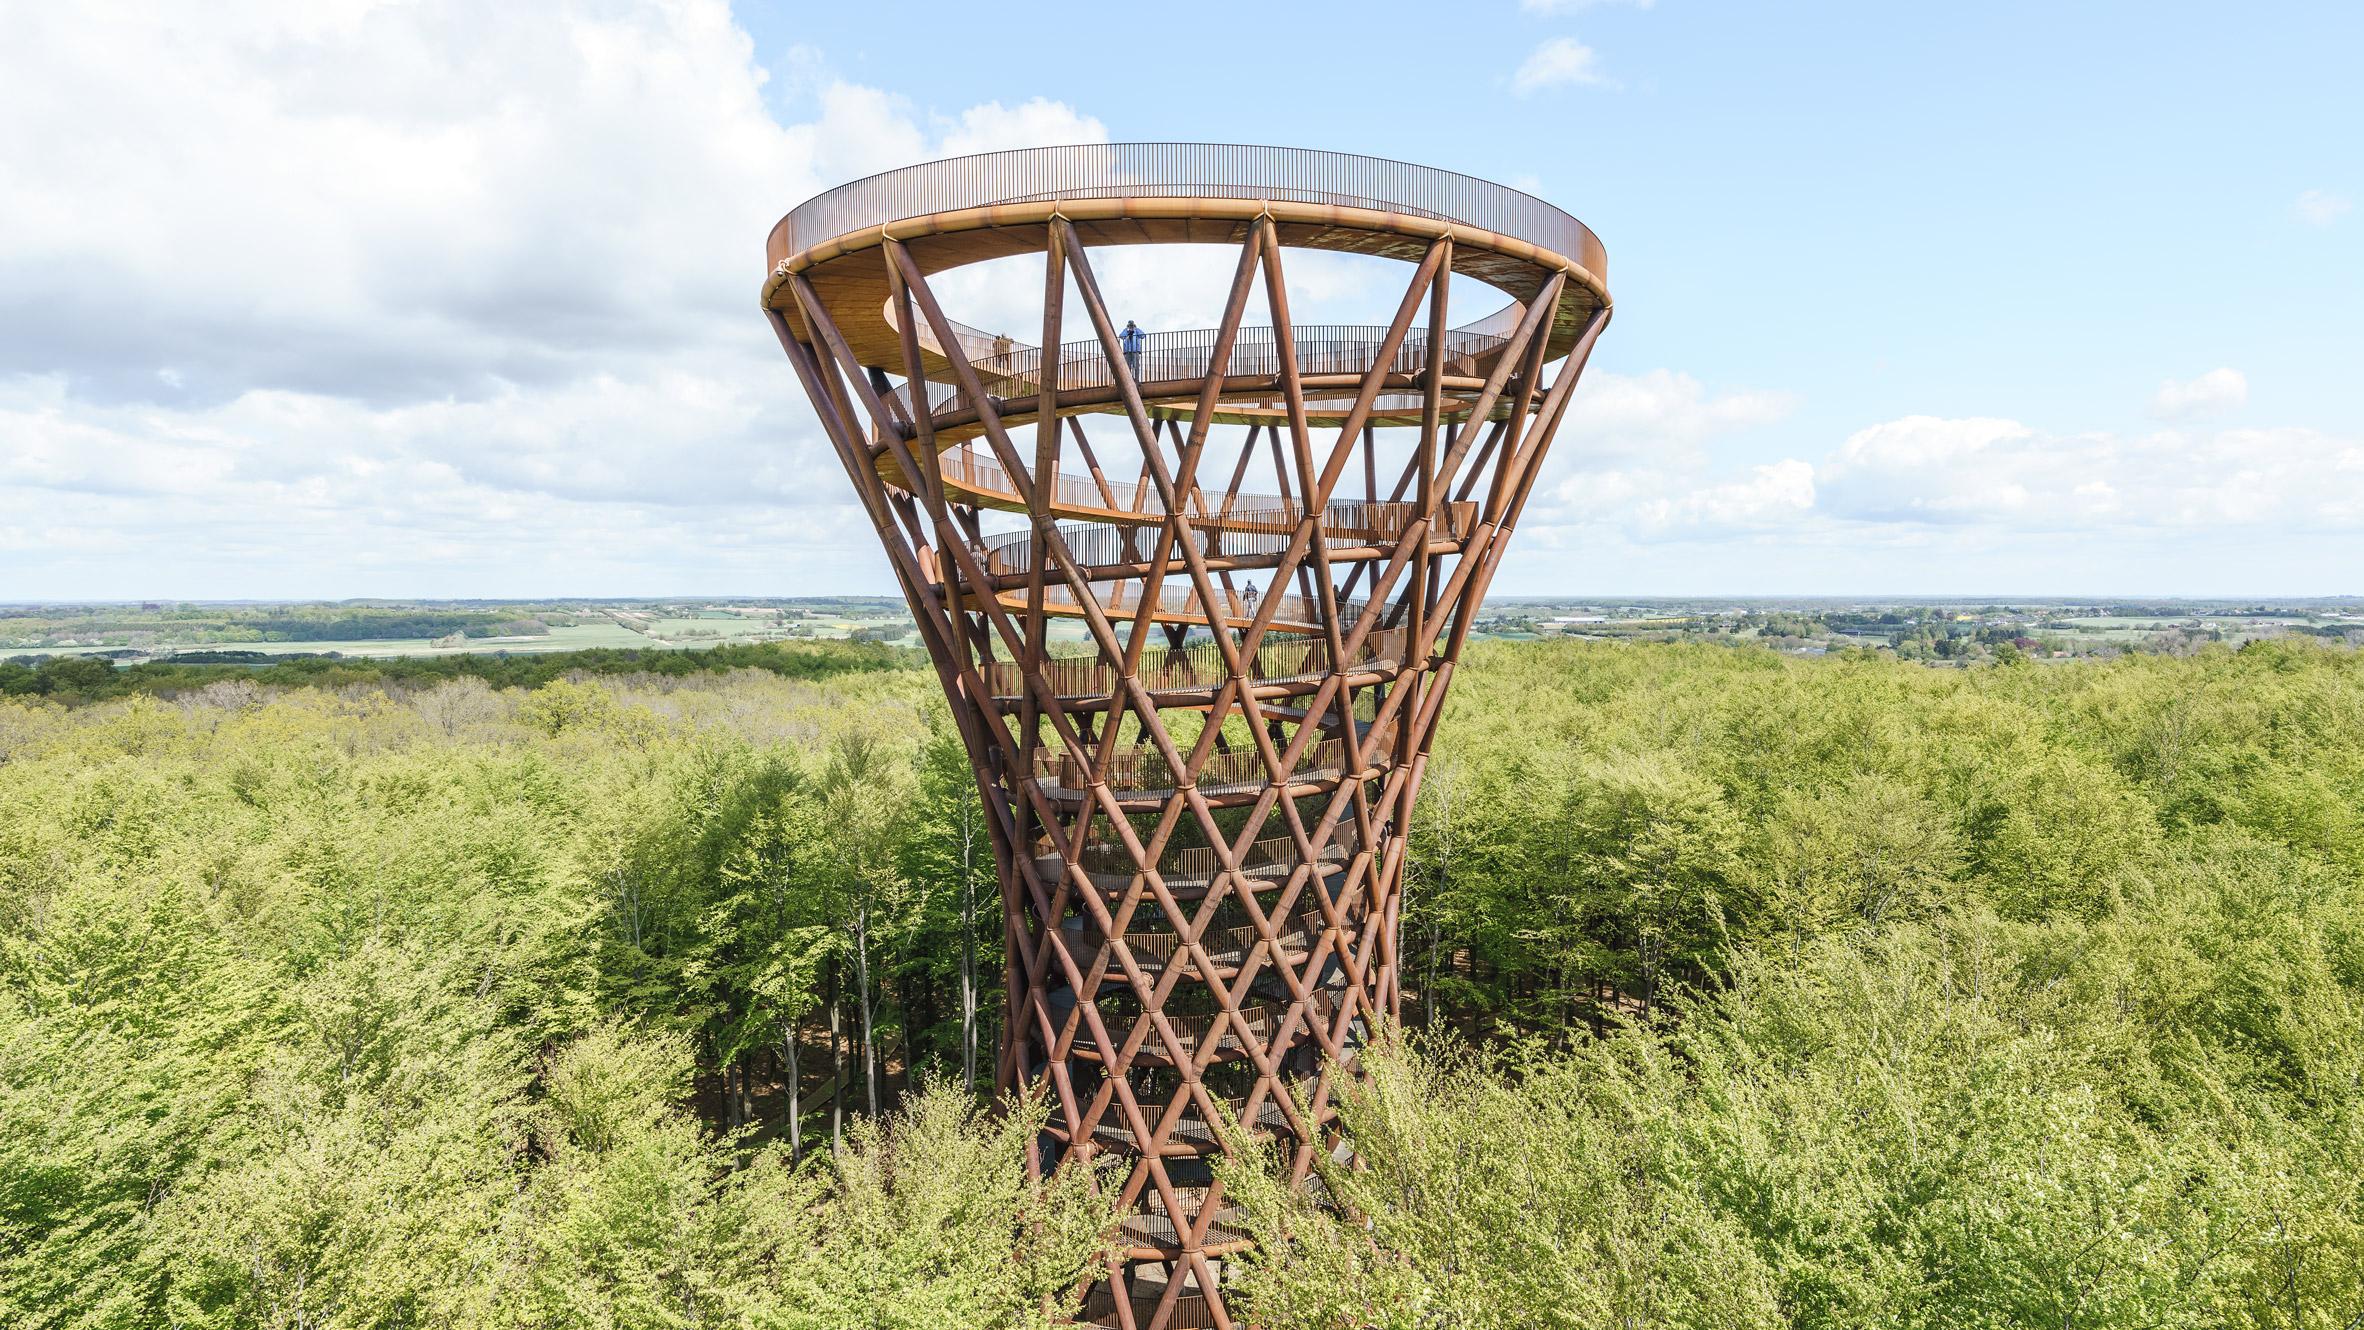 Camp Adventure tower in Denmark by EFFEKT